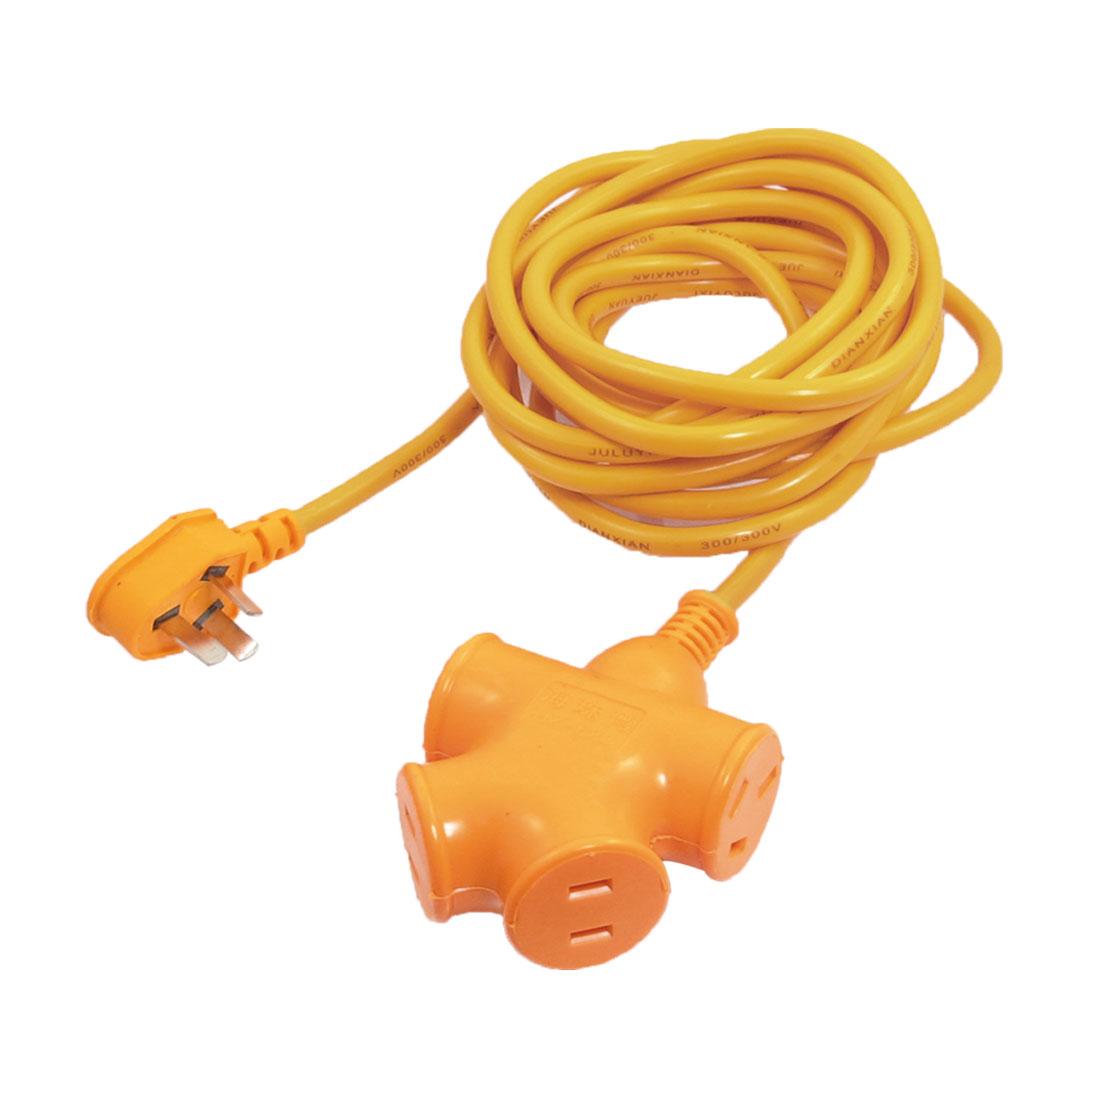 AC 250V 16A 3 Pin AU Plug to Flat 2-Pin Socket Power Cord Adapter 8m